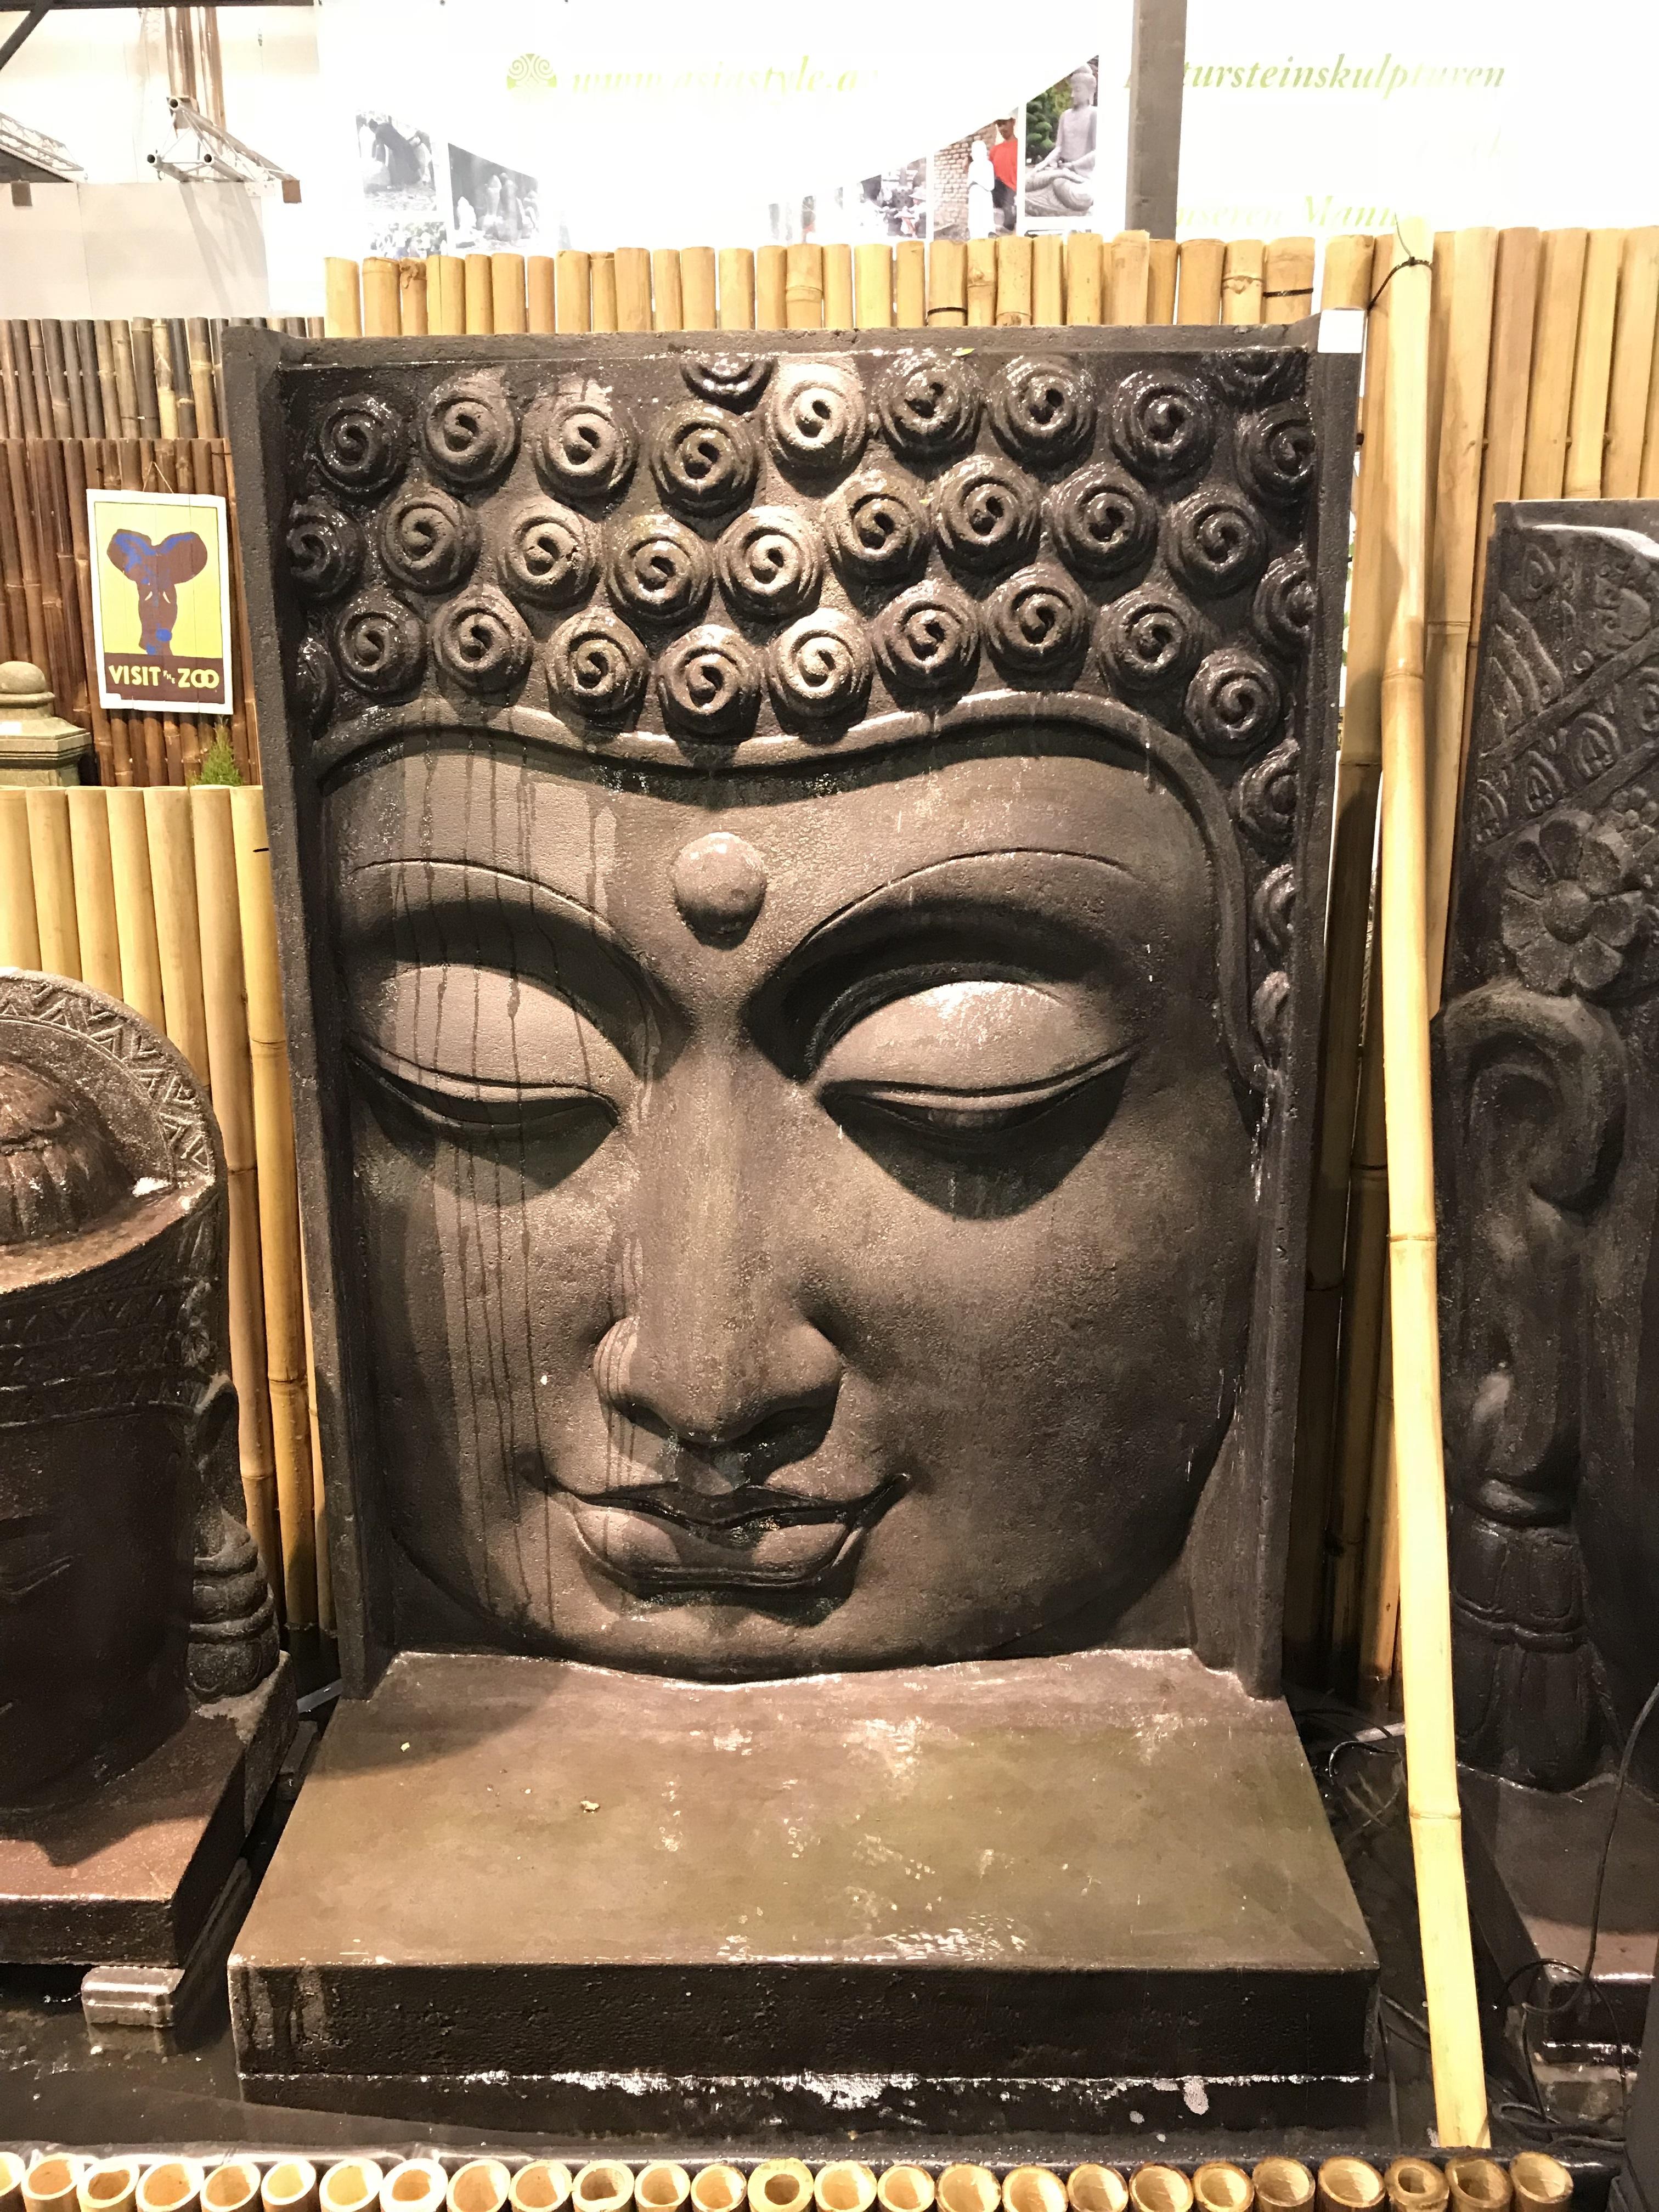 asiastyle buddha kopf relief als wasserspiel komplett set ca 170 cm h he. Black Bedroom Furniture Sets. Home Design Ideas